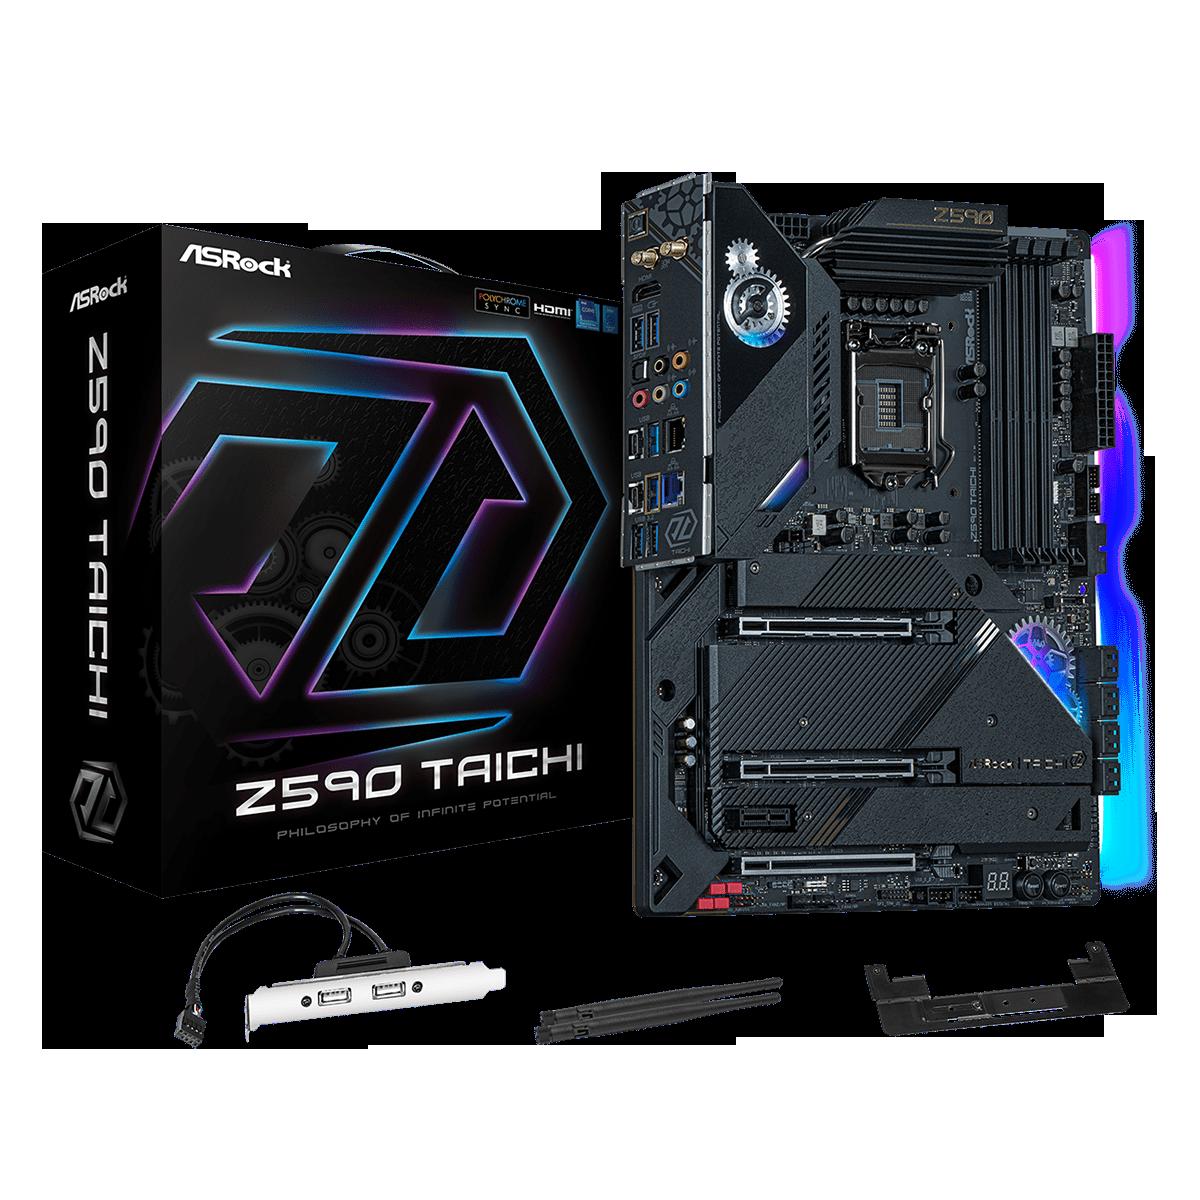 Placa Mãe ASRock Z590 Taichi, Chipset Intel Z590, Socket 1200, ATX, DDR4